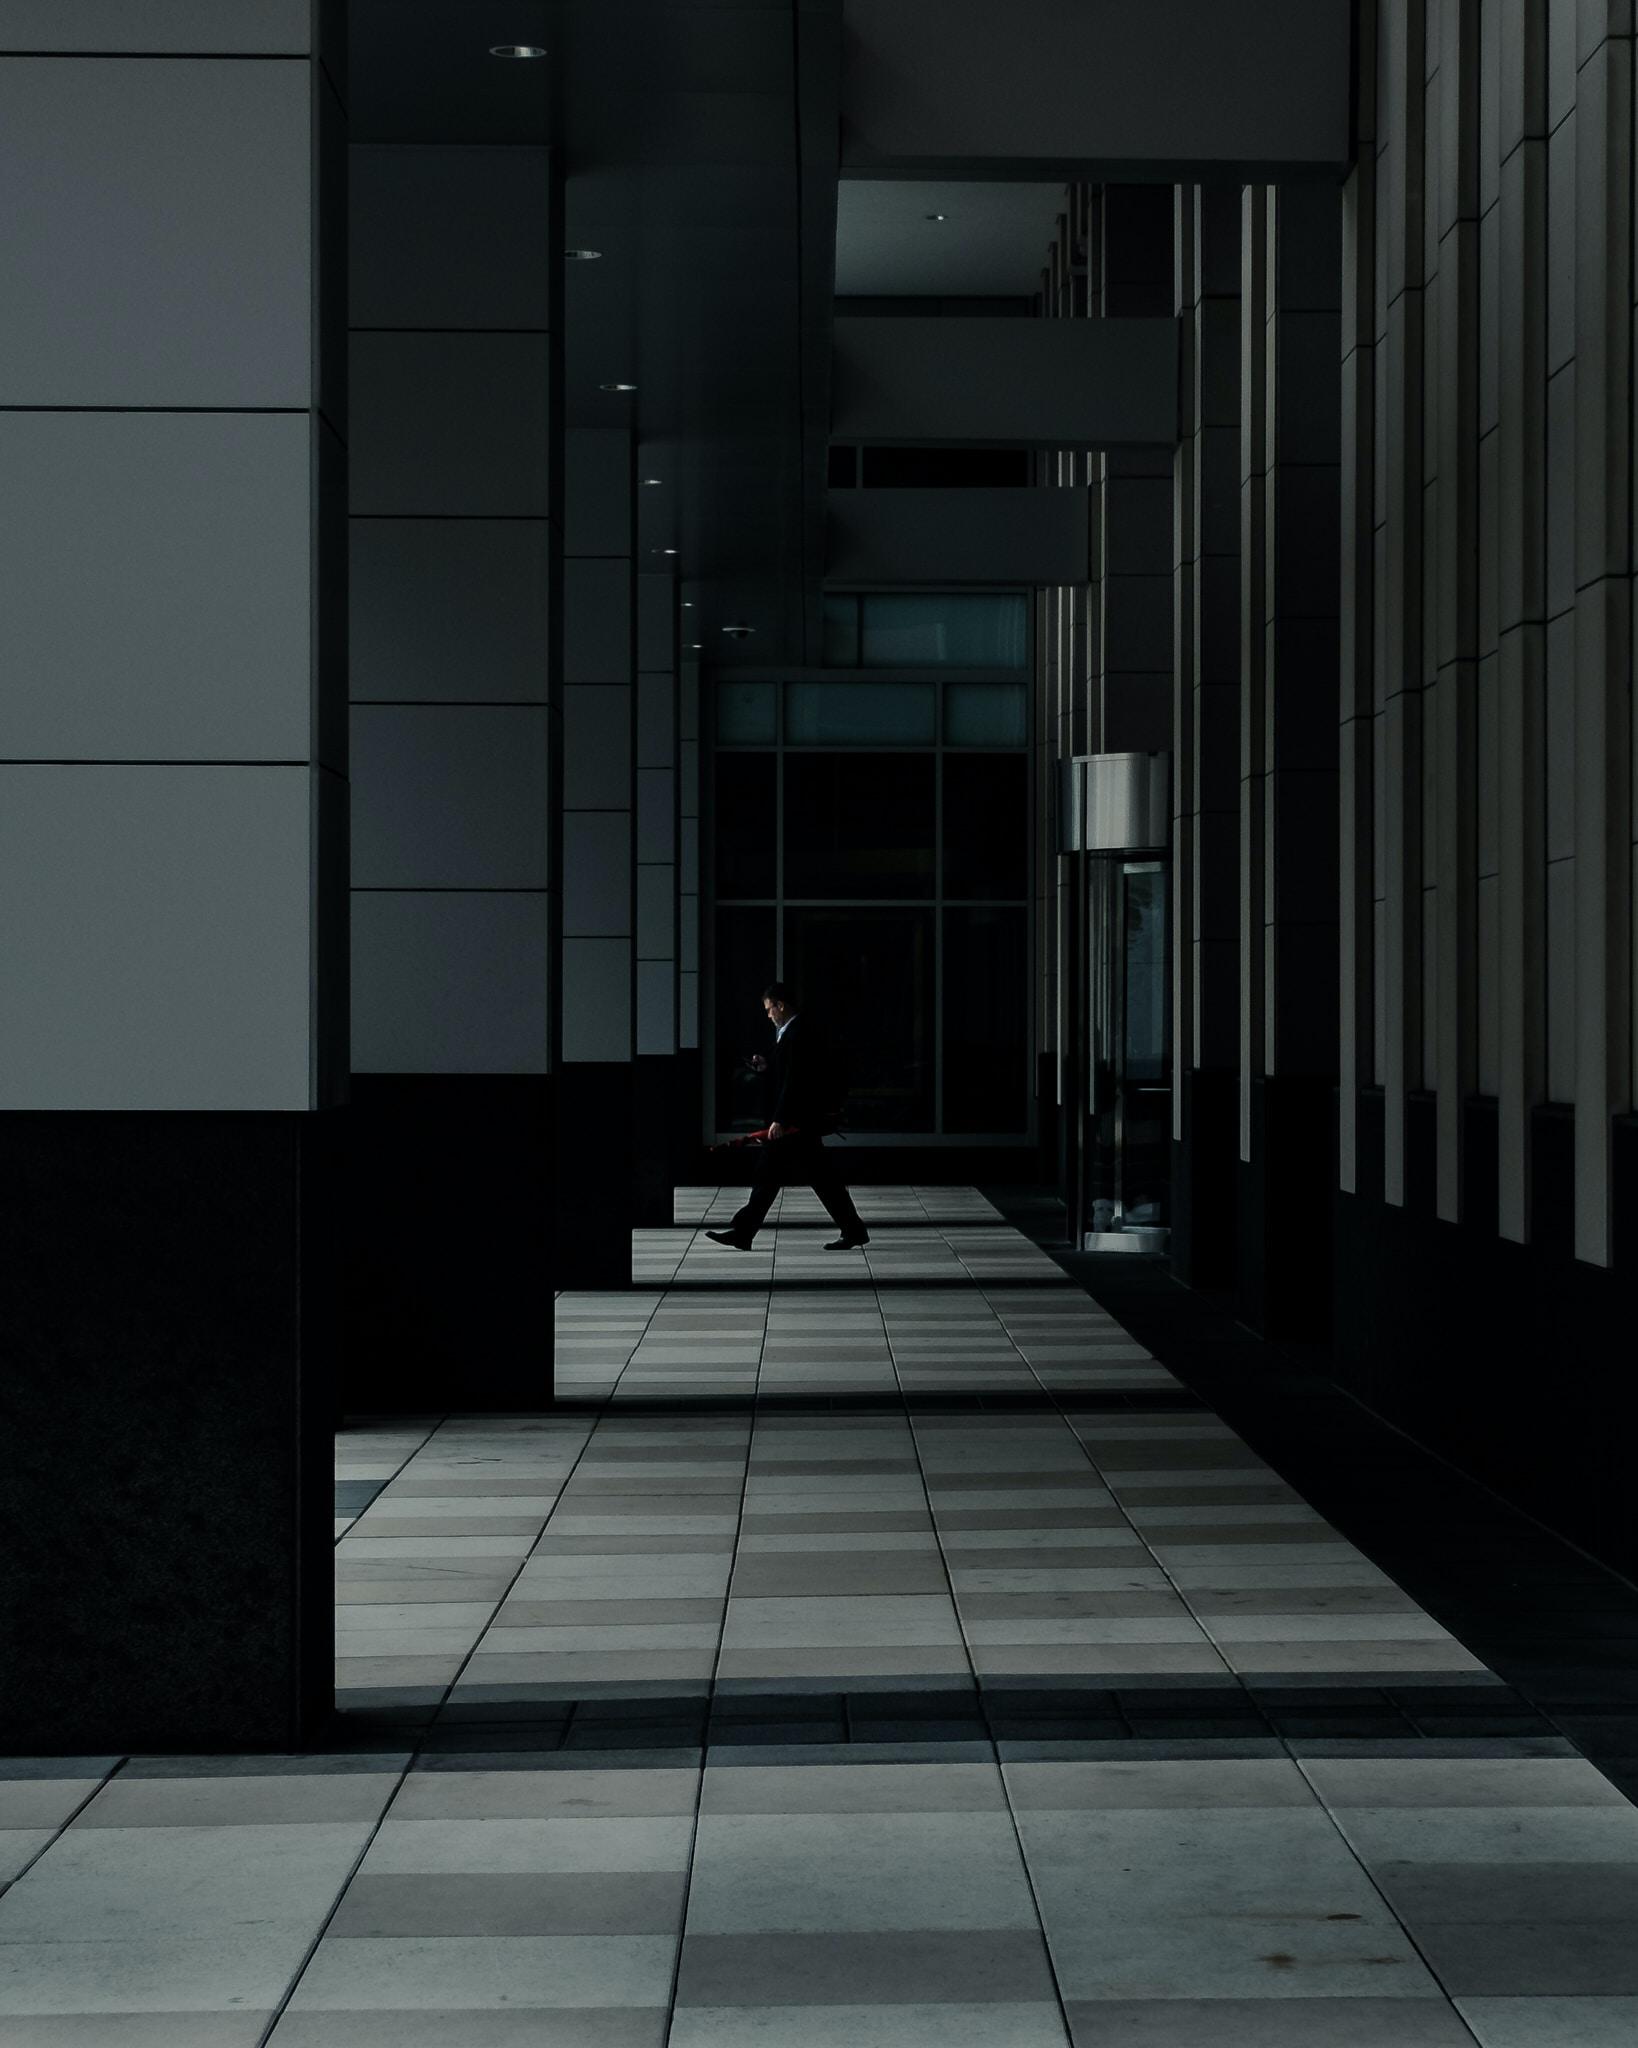 man standing in hallways